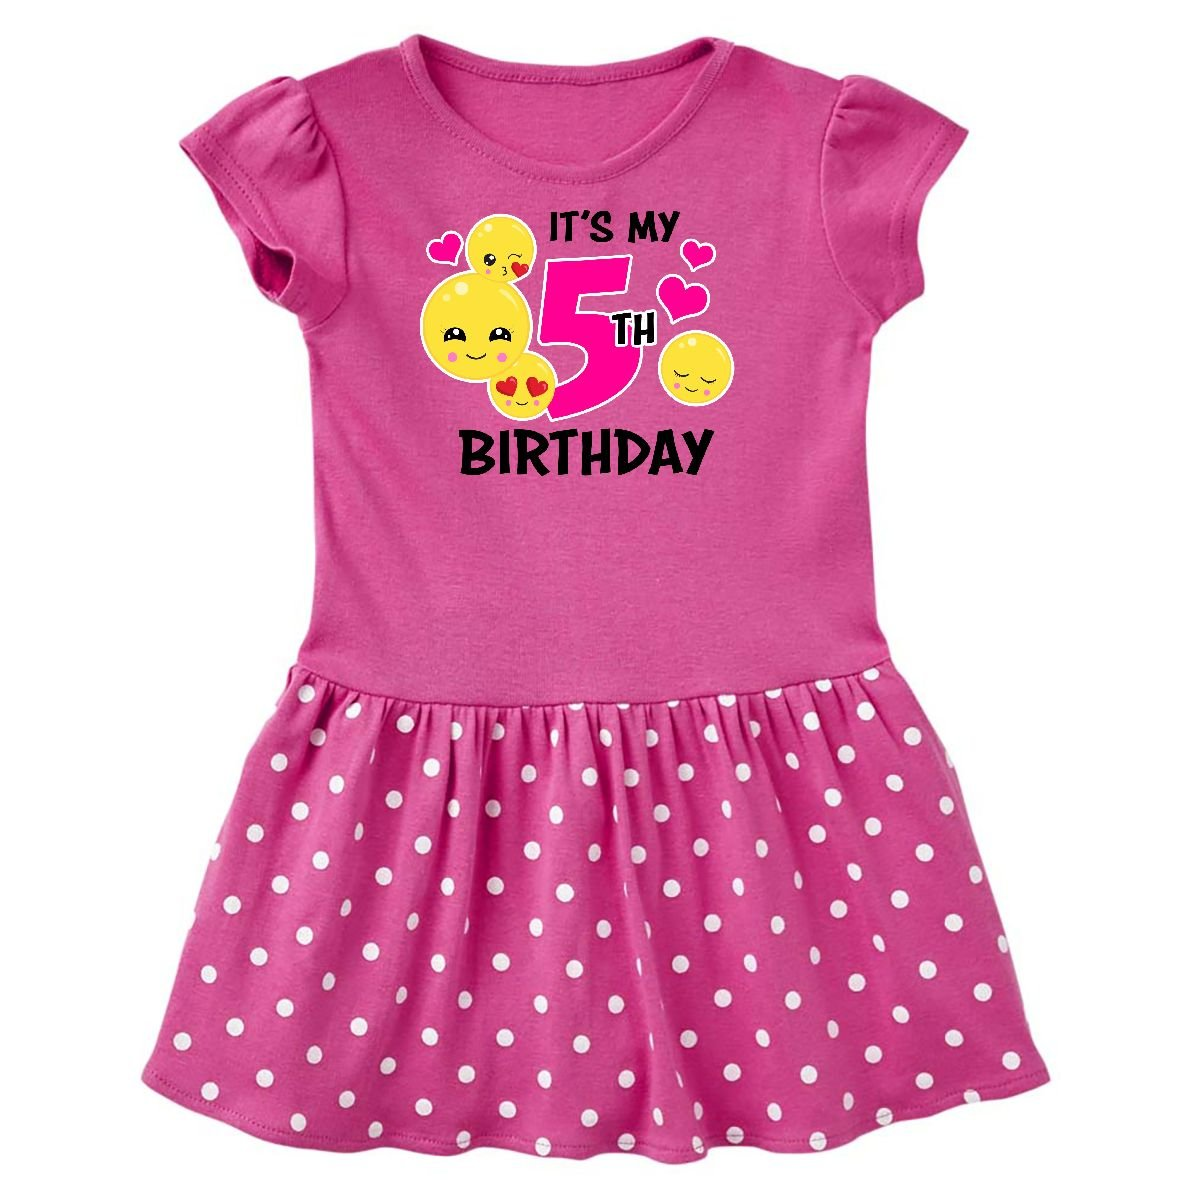 inktastic - Its My 5th Birthday Emojis Toddler Dress 14-196261-198